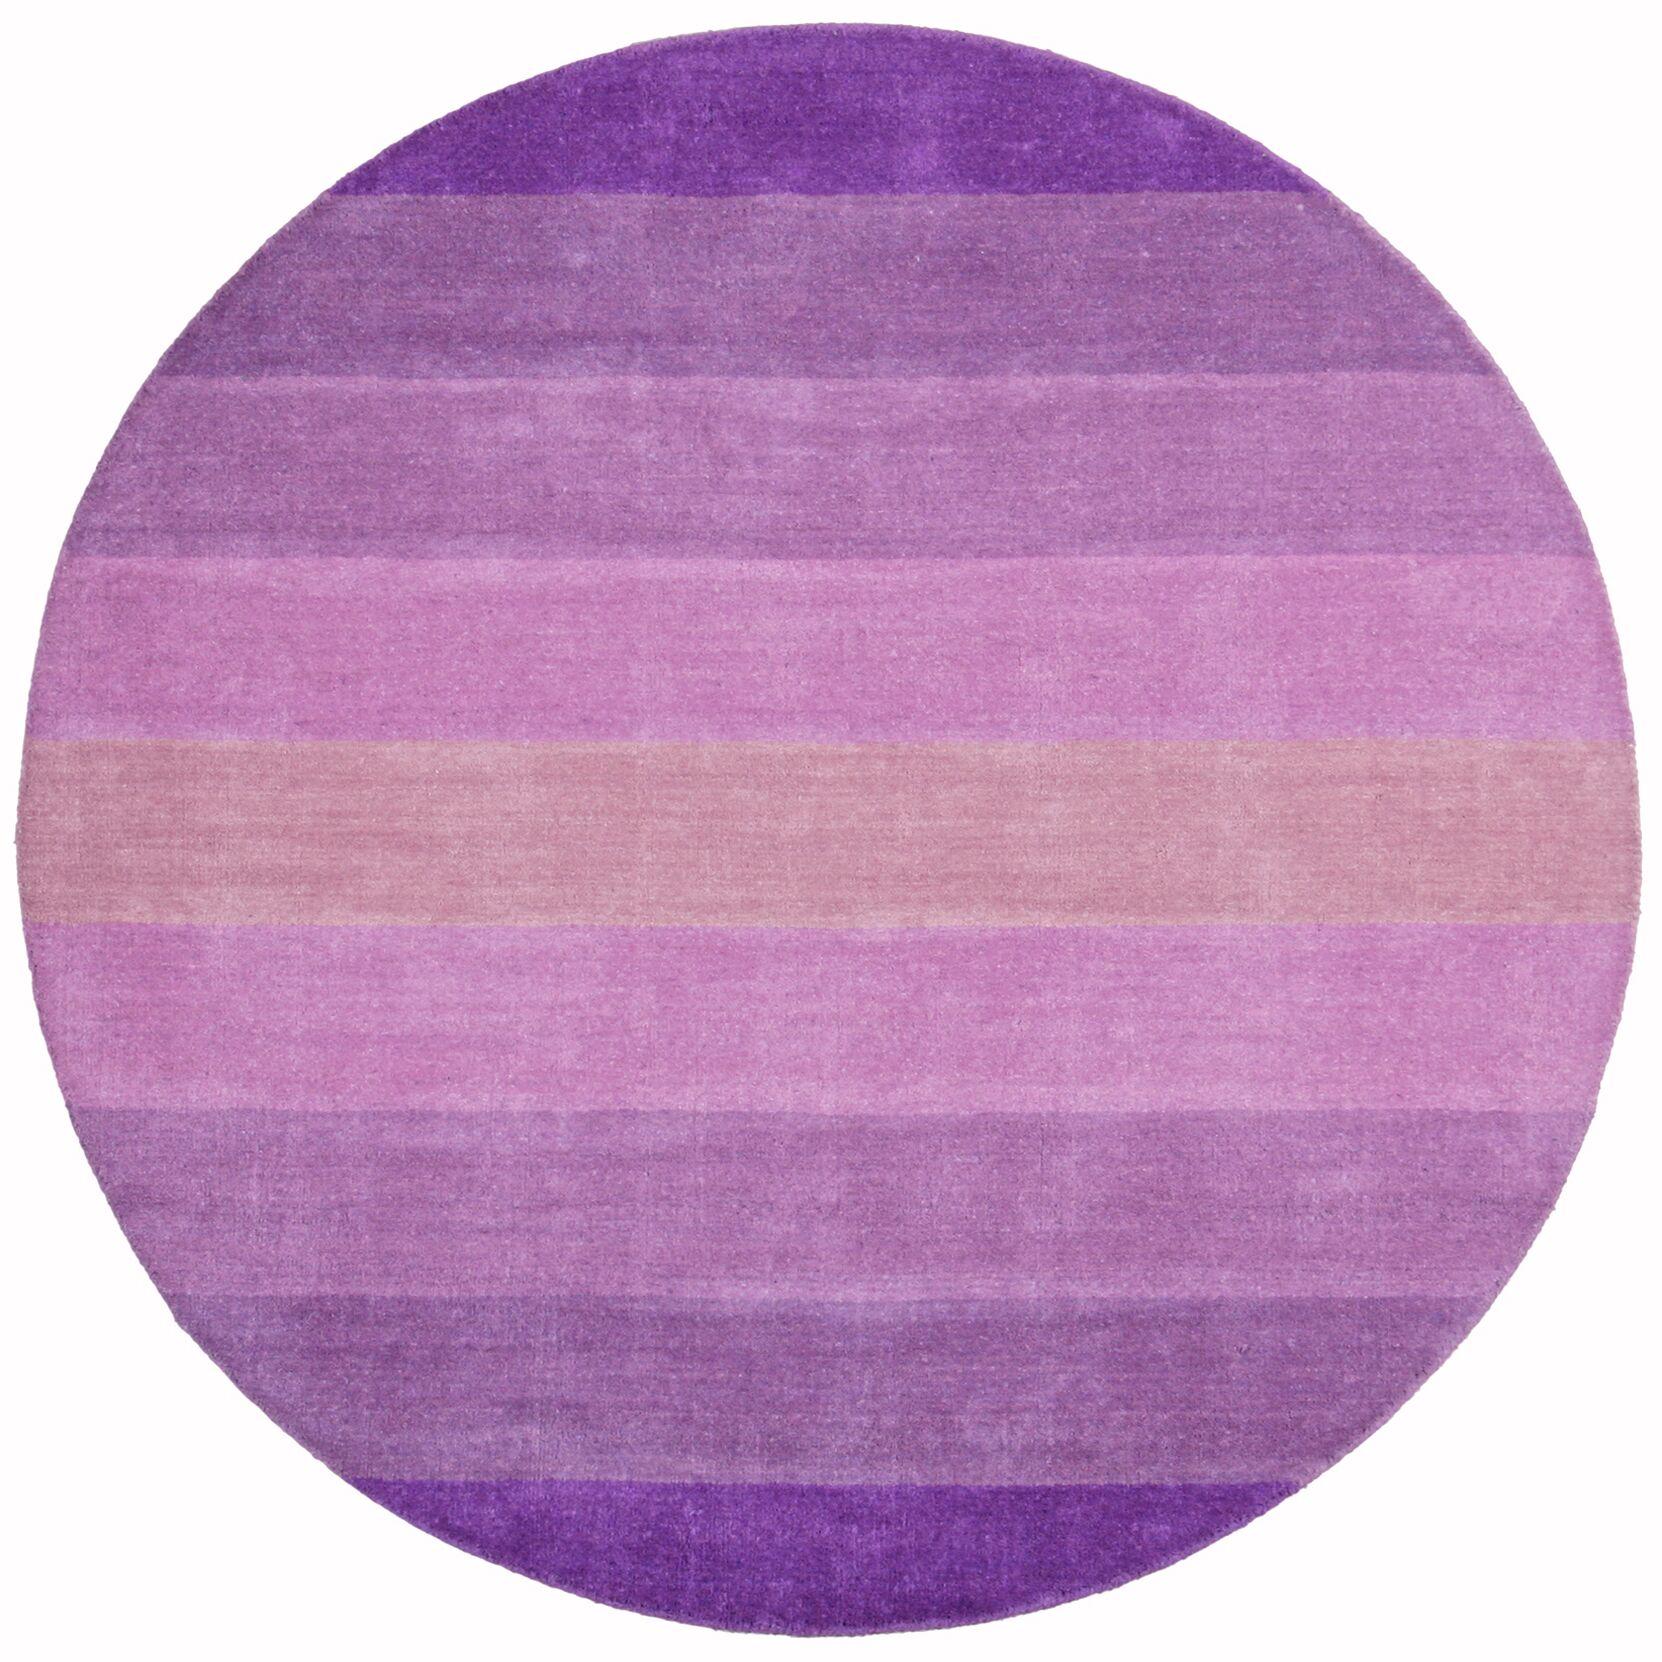 Degarmo Purple Stripes Area Rug Rug Size: Round 6'